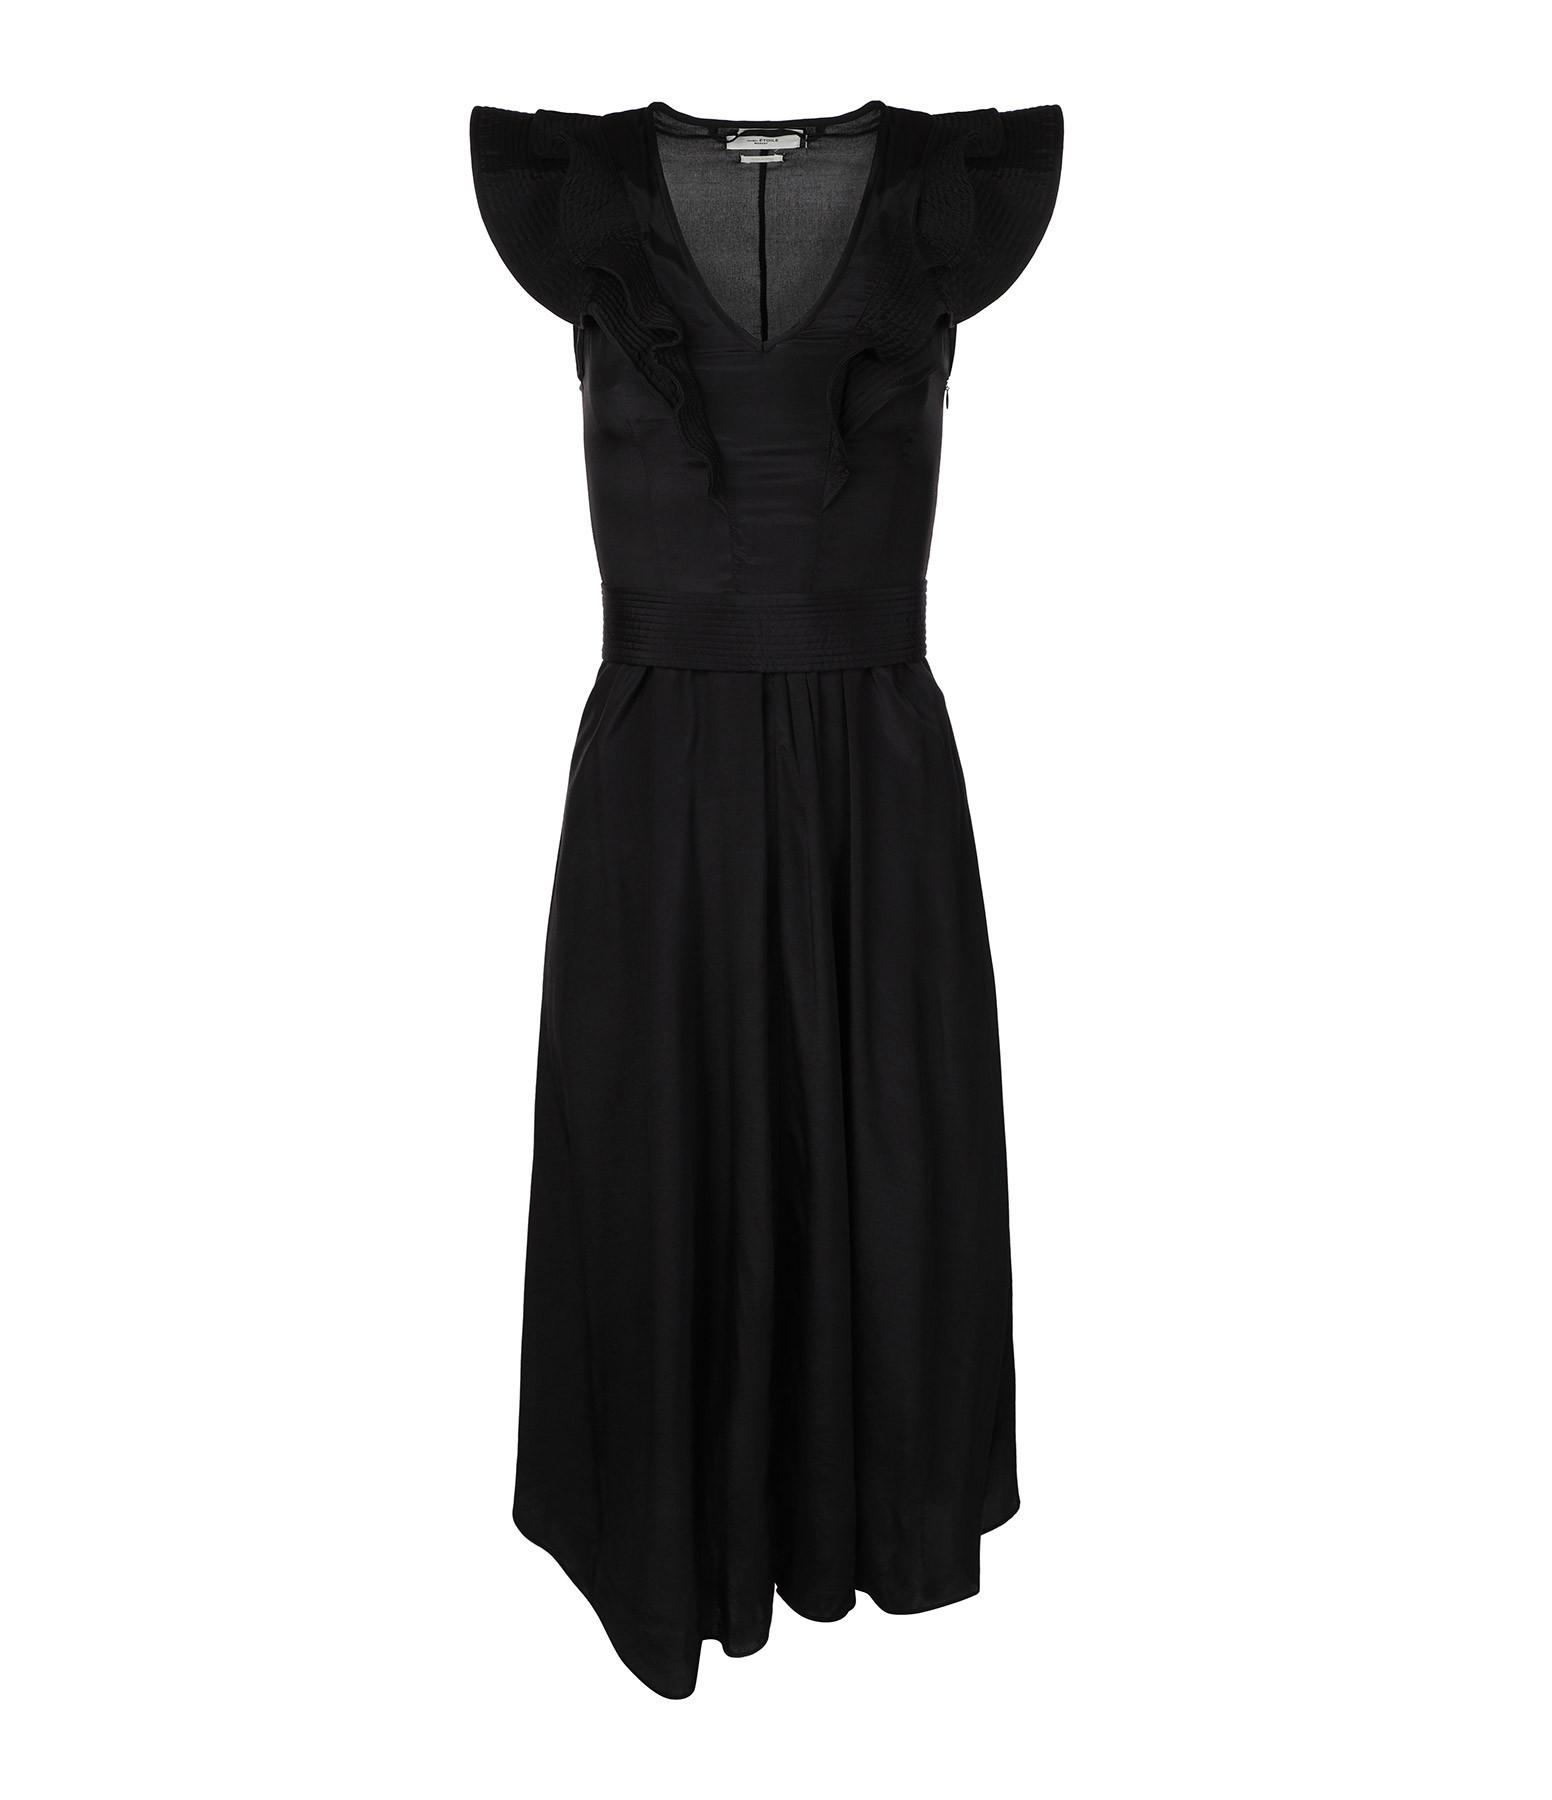 ISABEL MARANT ÉTOILE - Robe Coraline Noir